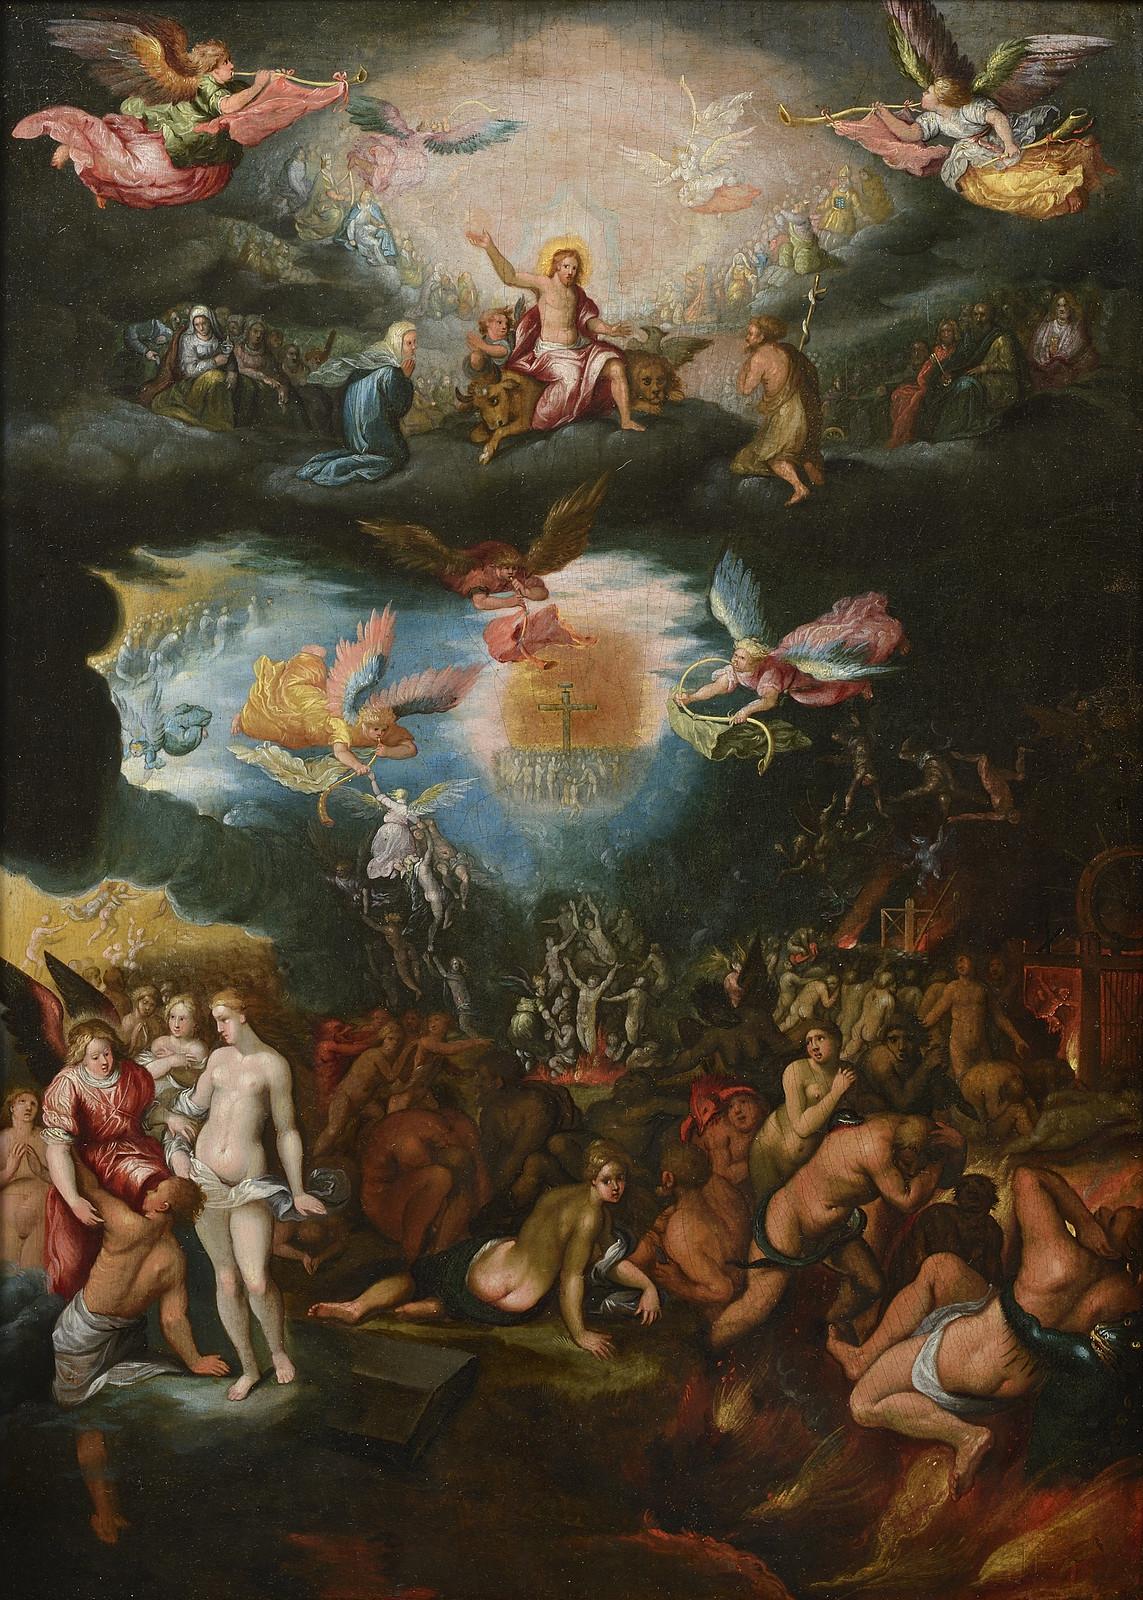 Frans Francken the Younger - The Last  Judgement, after 1619